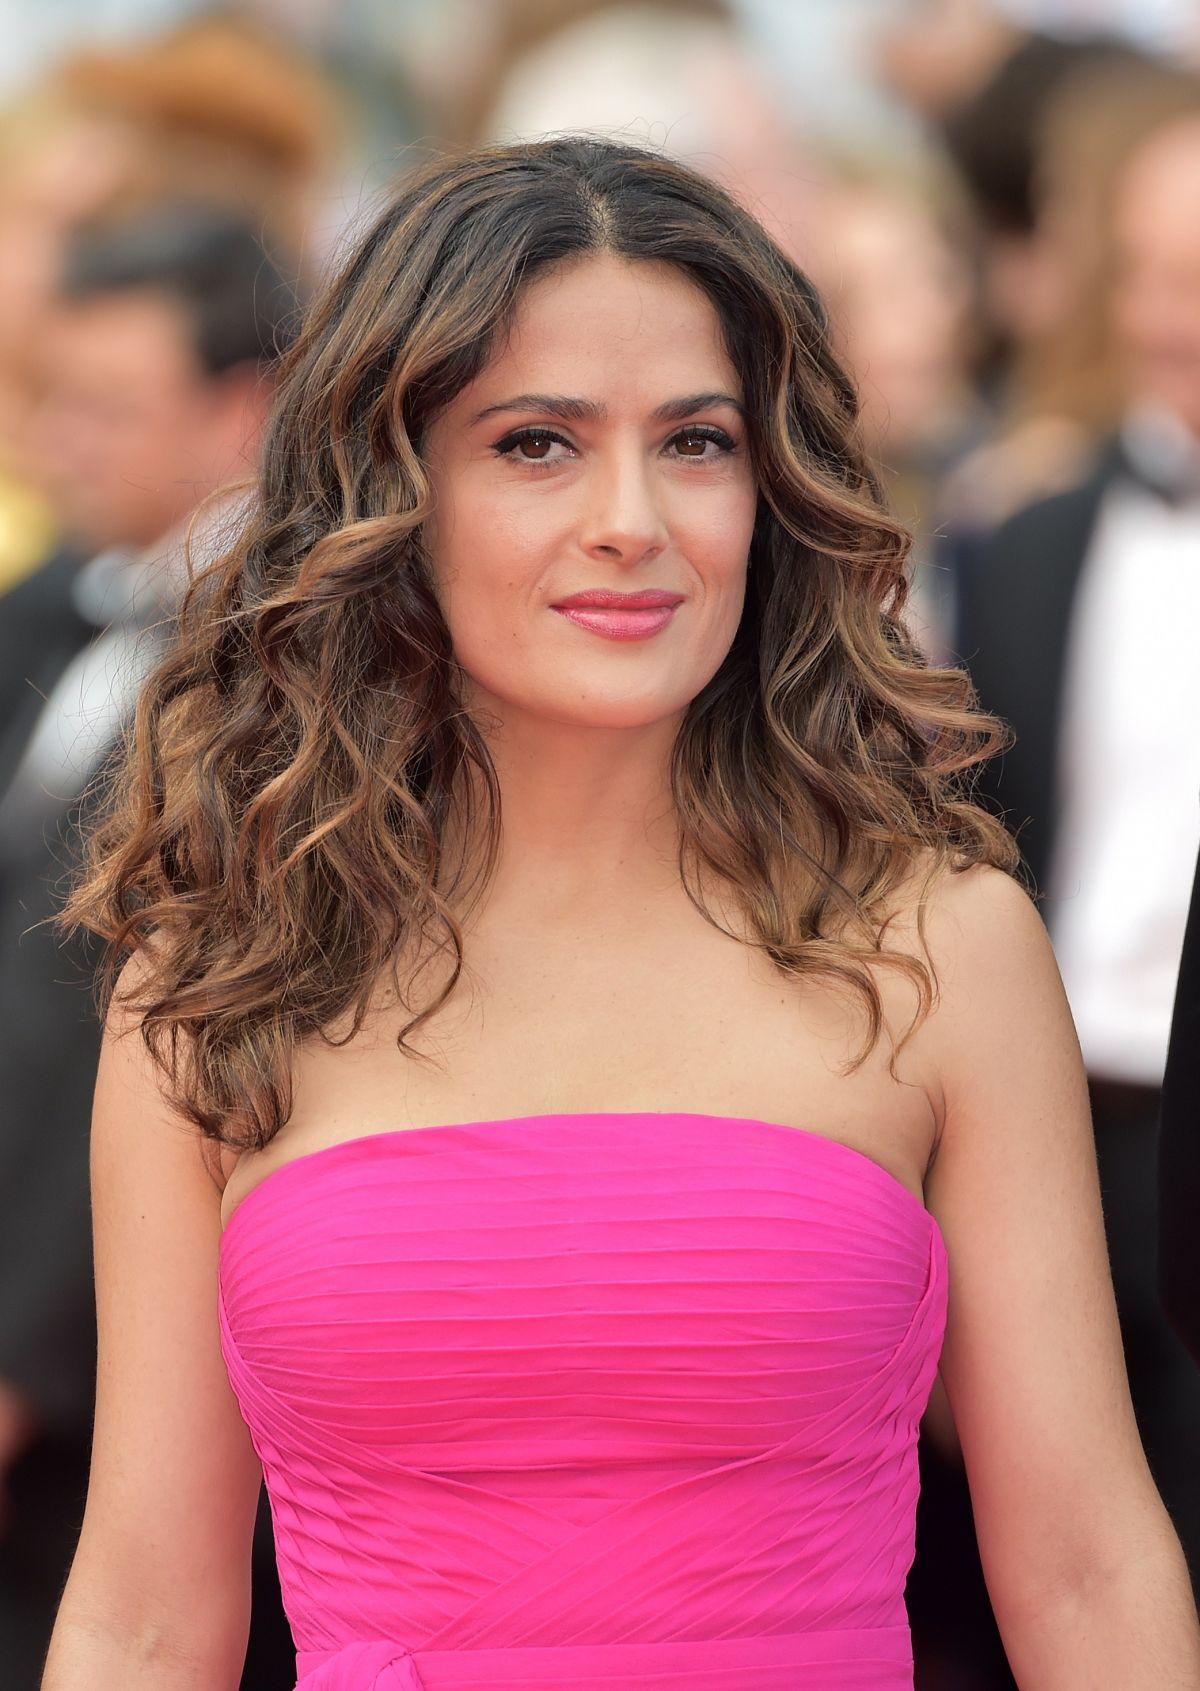 SALMA HAYEK at The Prohet Premiere at Cannes Film Festival ... Salma Hayek